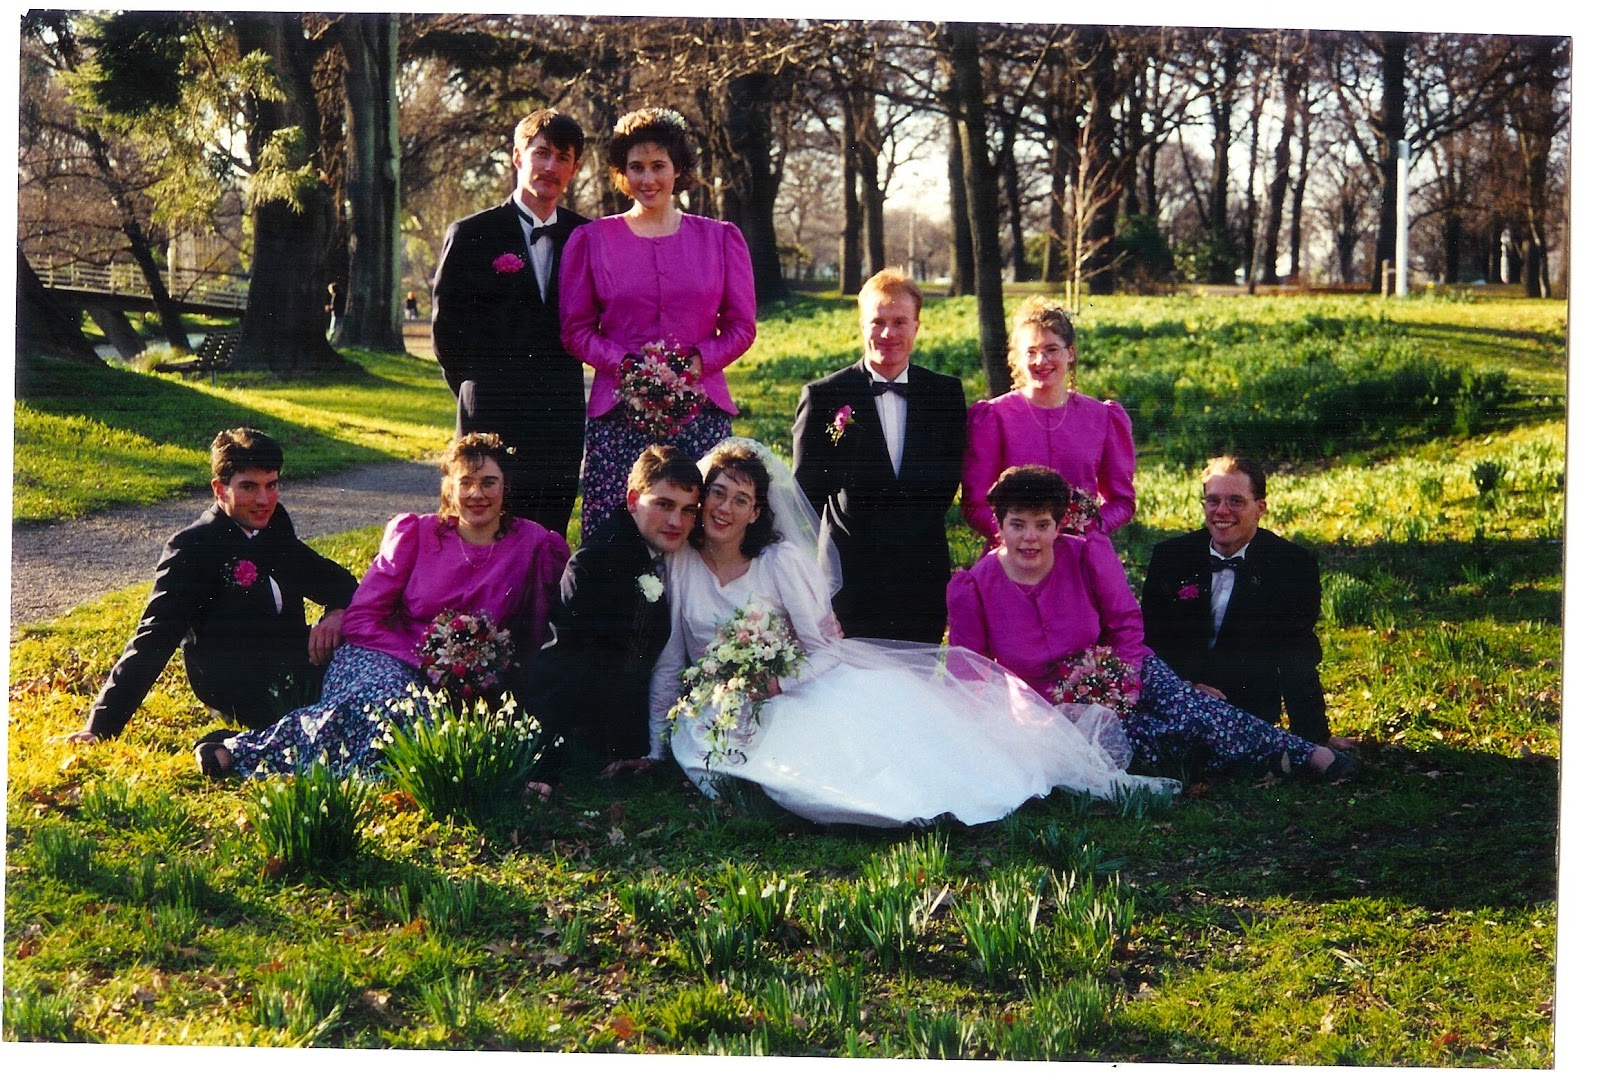 17th Wedding Anniversary